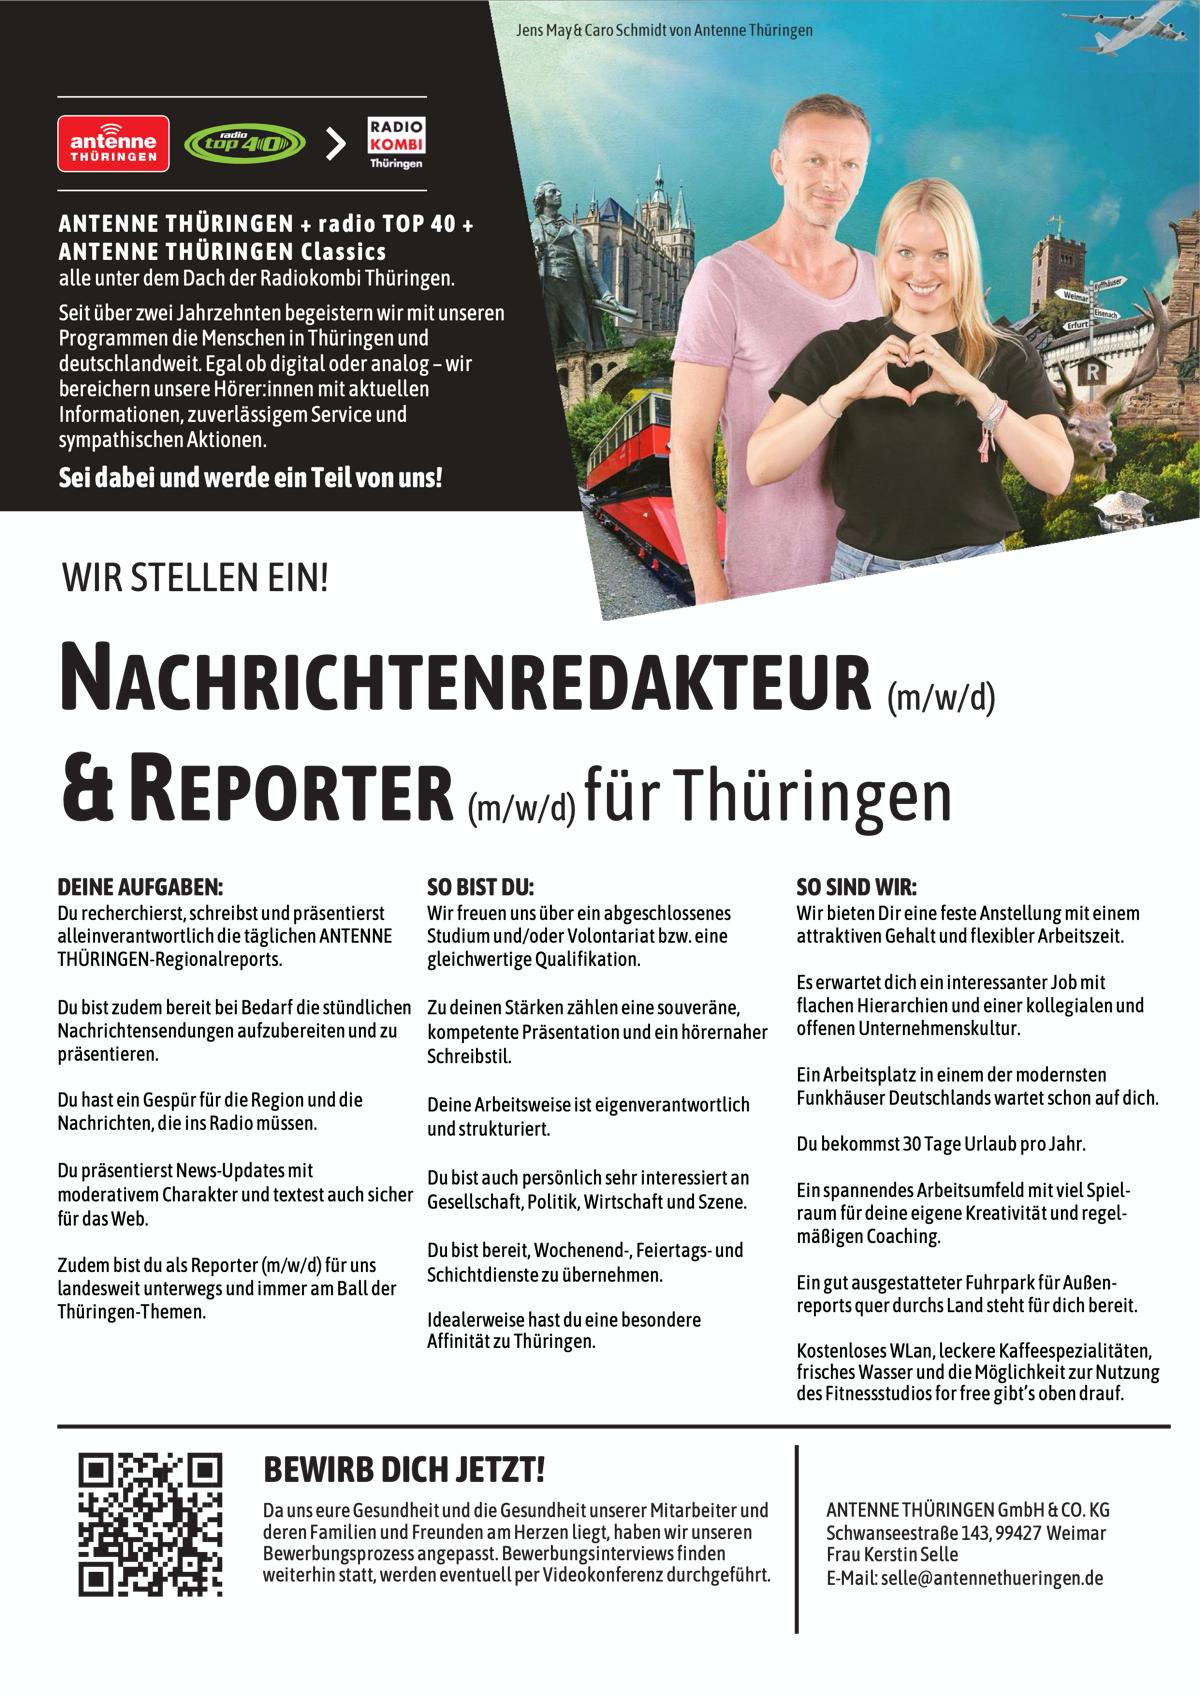 ANTENNE THÜRINGEN sucht Nachrichtenredakteur (m/w/d) & Reporter (m/w/d)